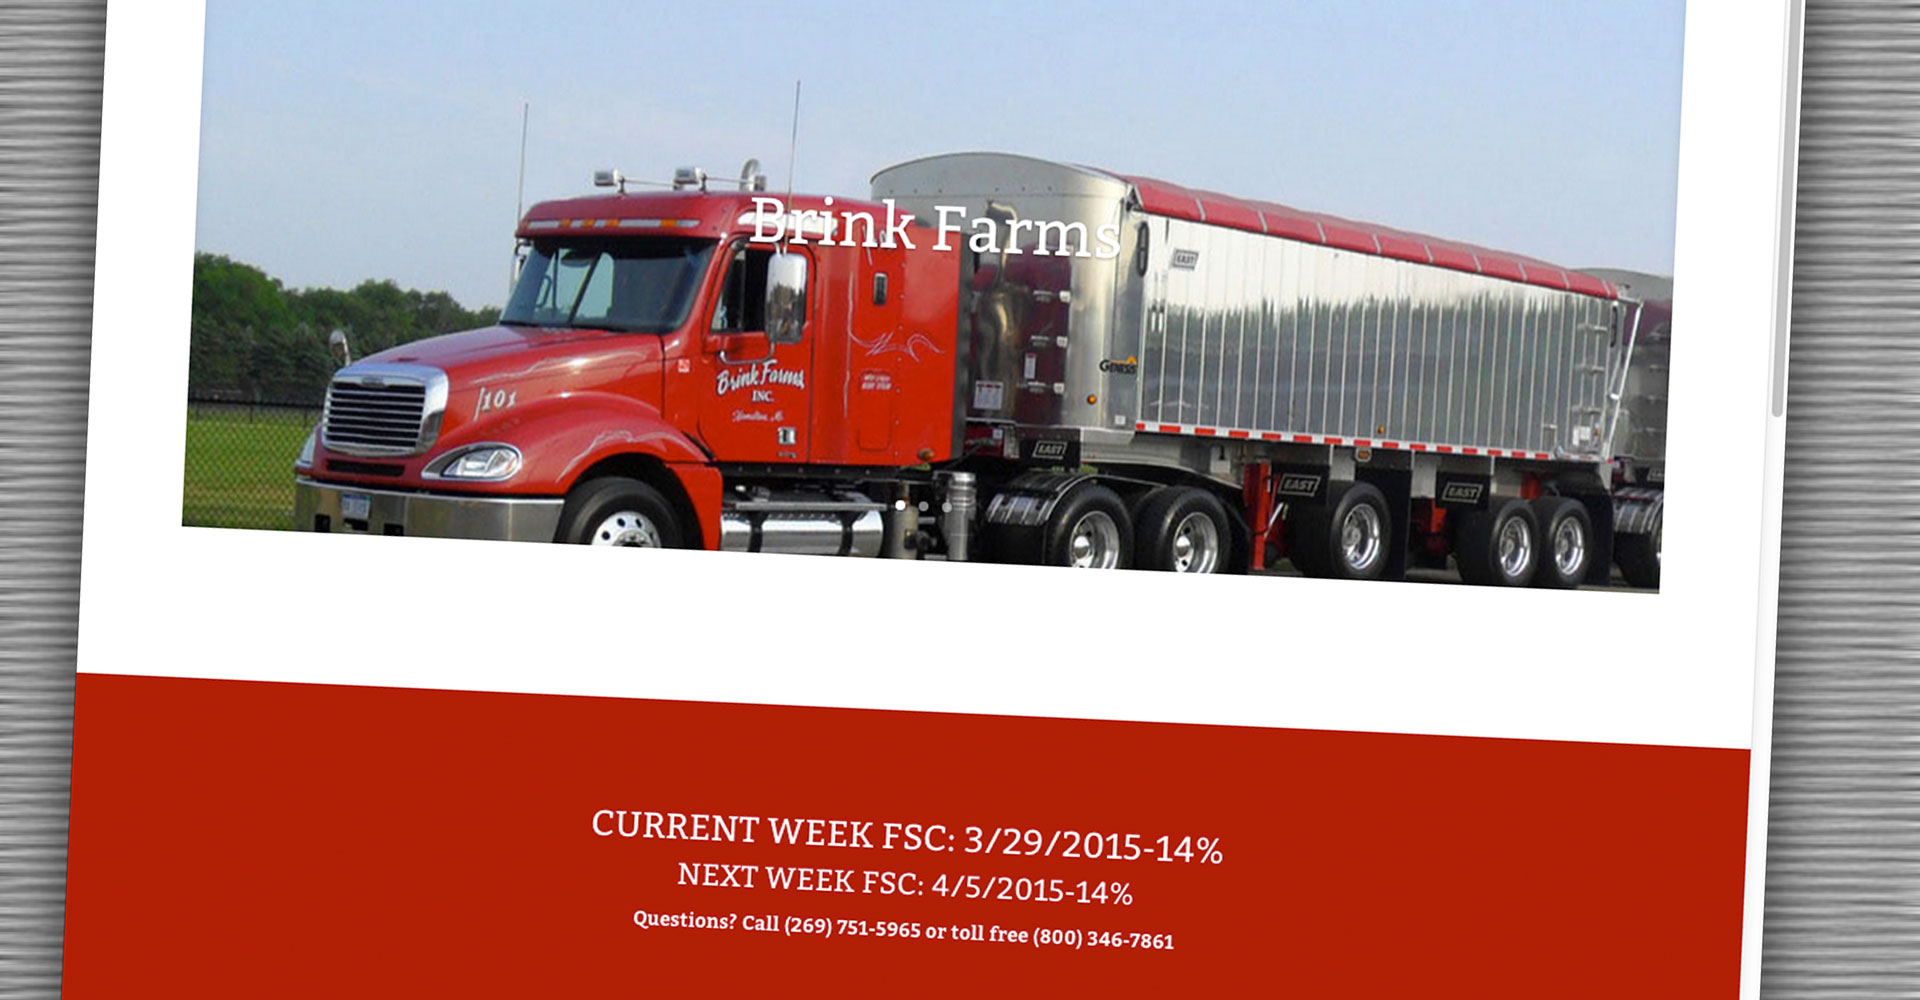 brink-farms-03